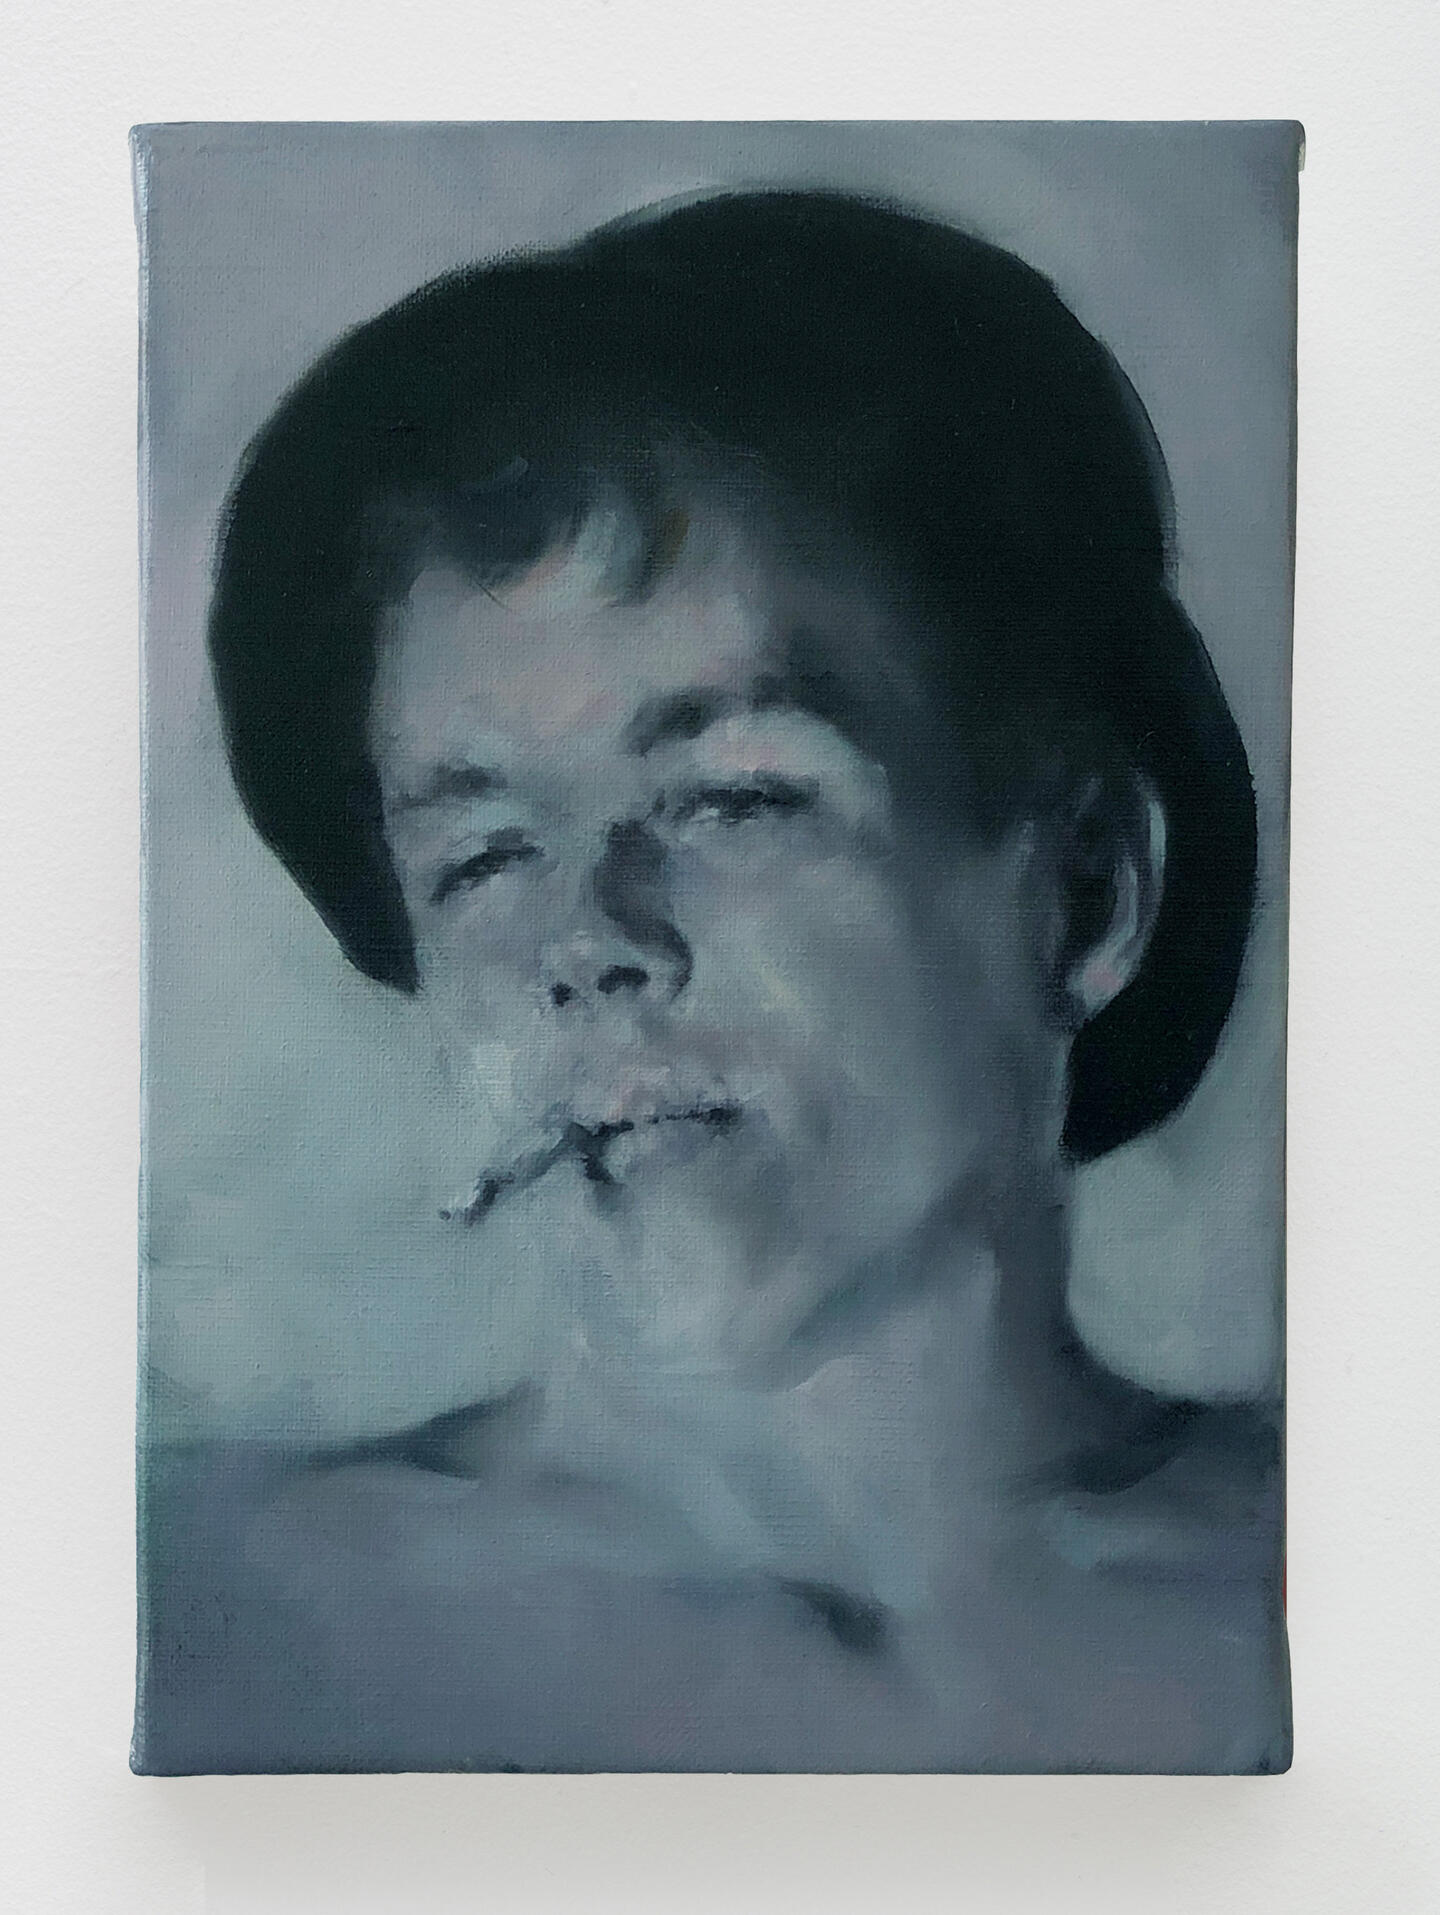 Paul P. untitled, 2021